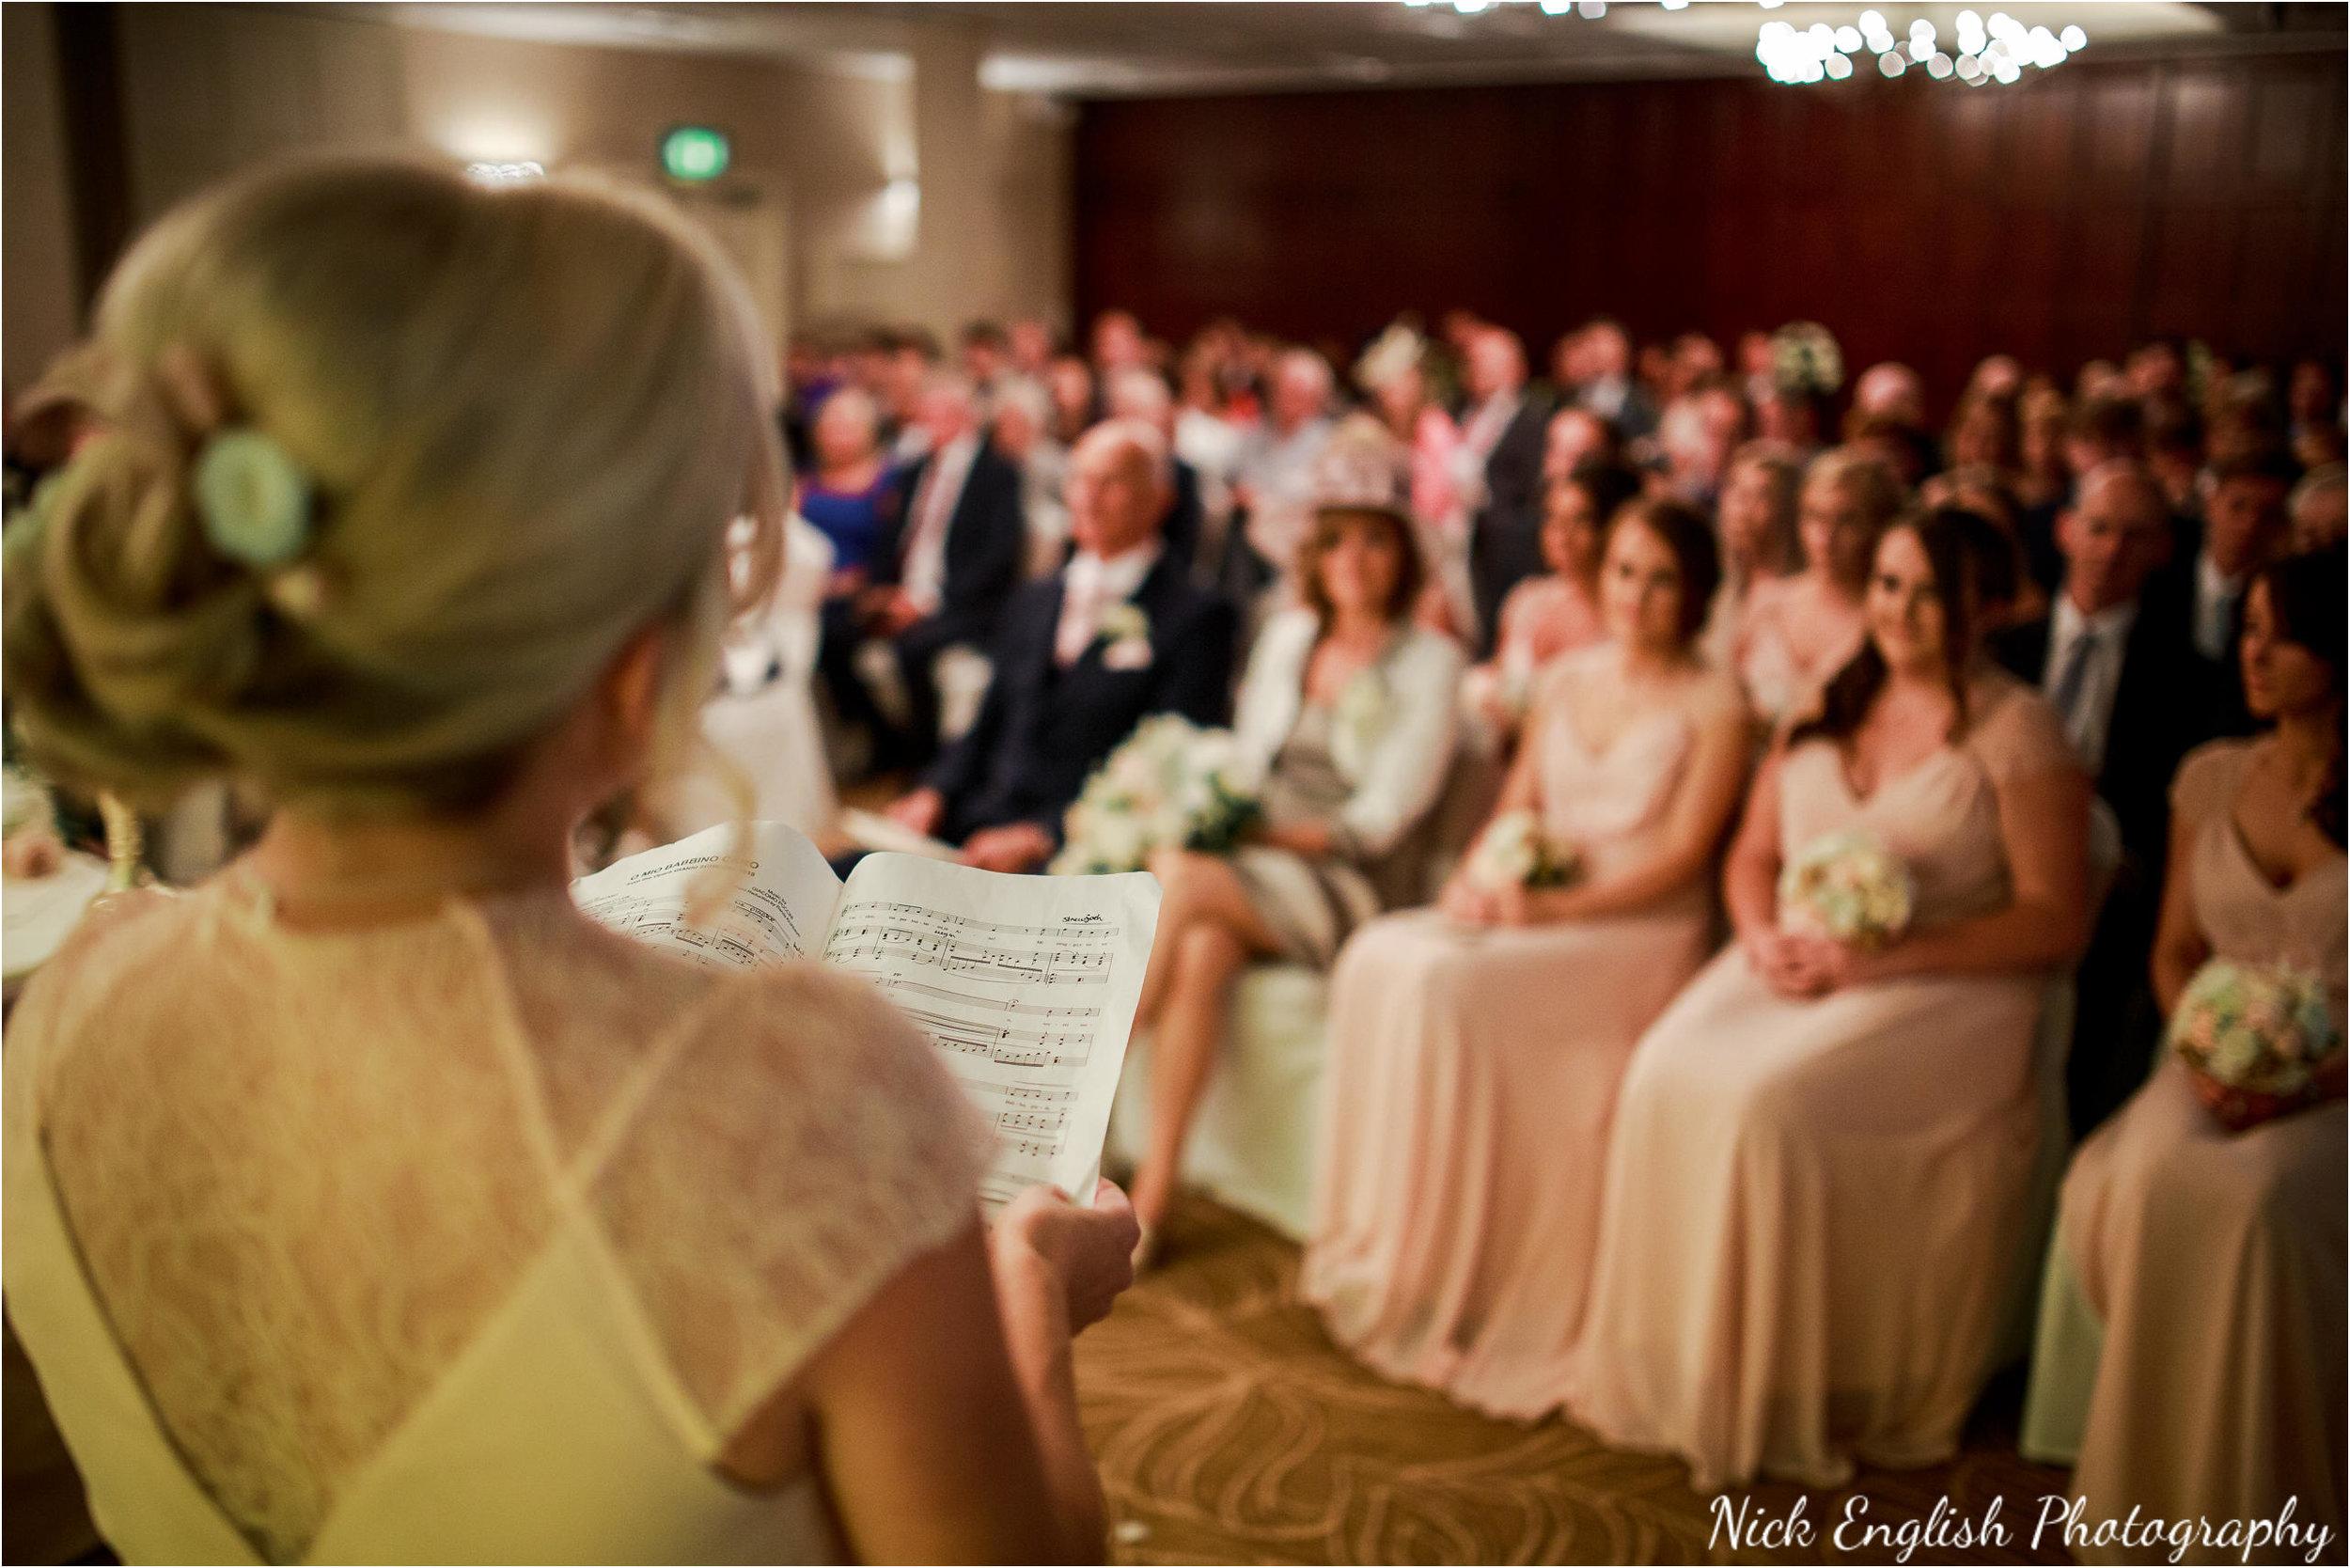 Emily David Wedding Photographs at Barton Grange Preston by Nick English Photography 78jpg.jpeg